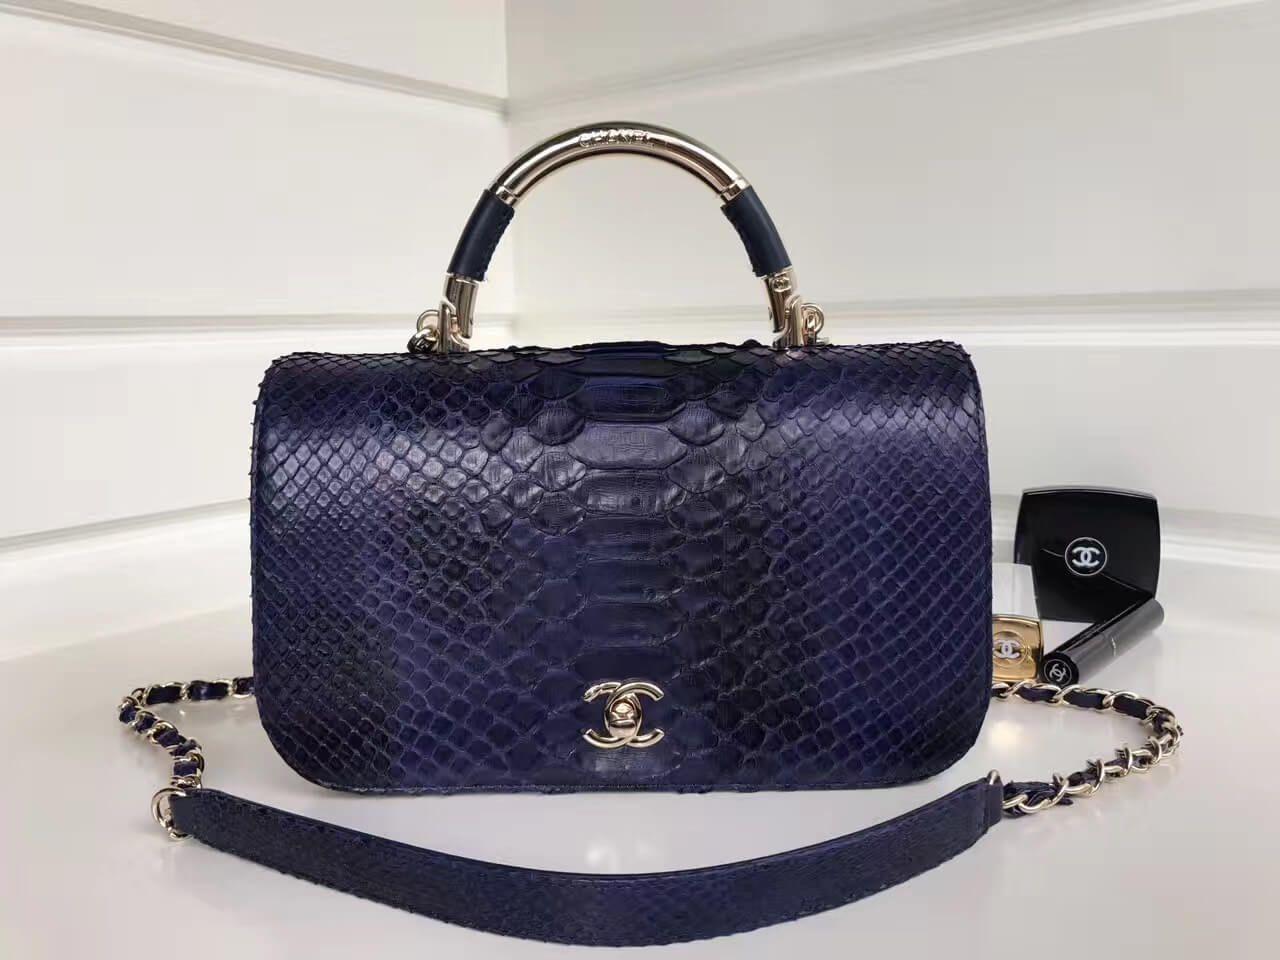 Chanel Python Leather Carry Chic Medium Top Handle Flap Bag A93752 Deep Blue 2017